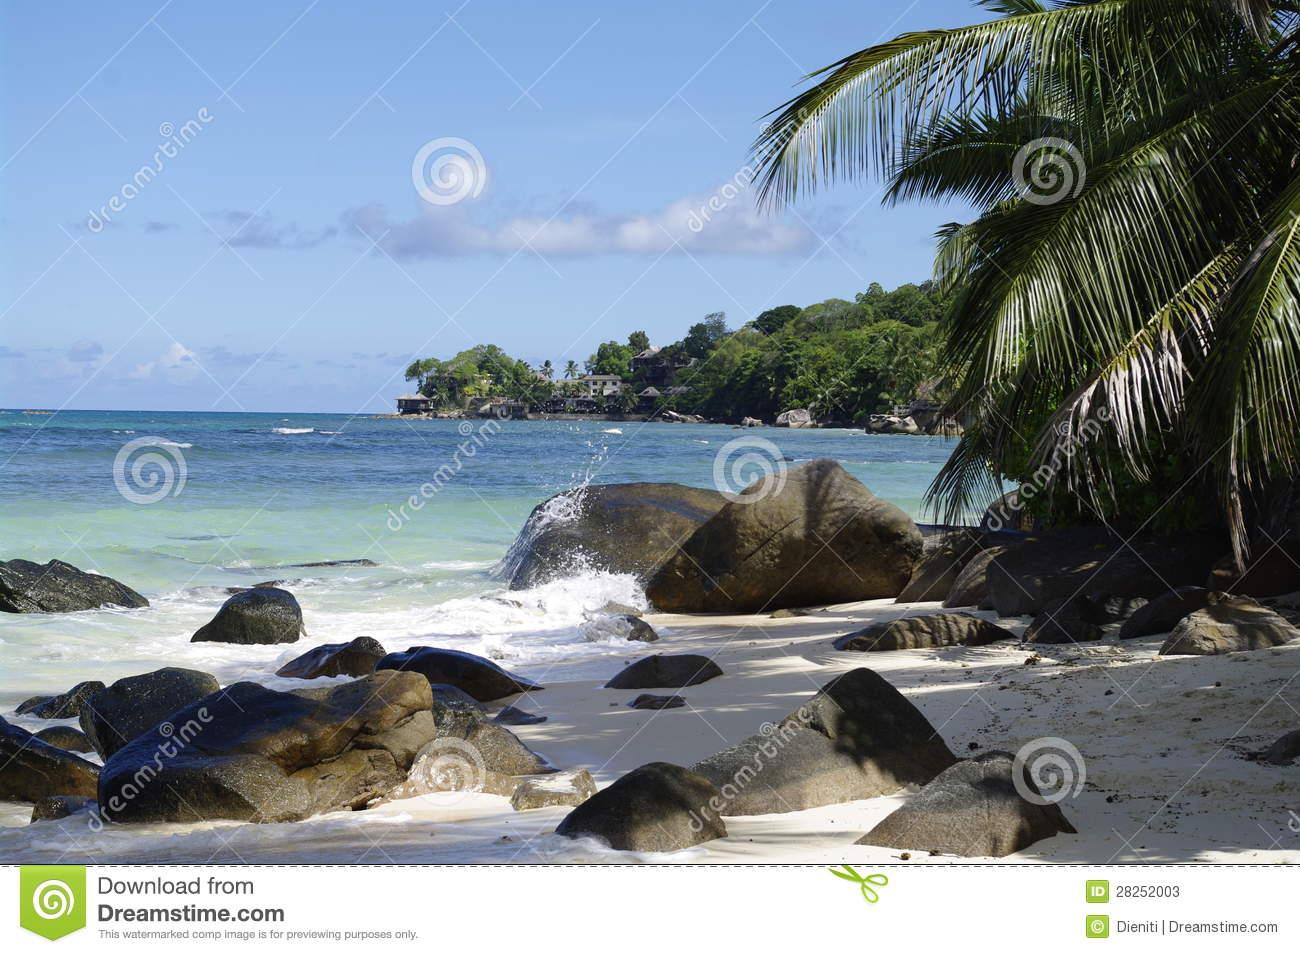 Shady Place Under Palm Trees At Beau Vallon Beach, Seychelles.